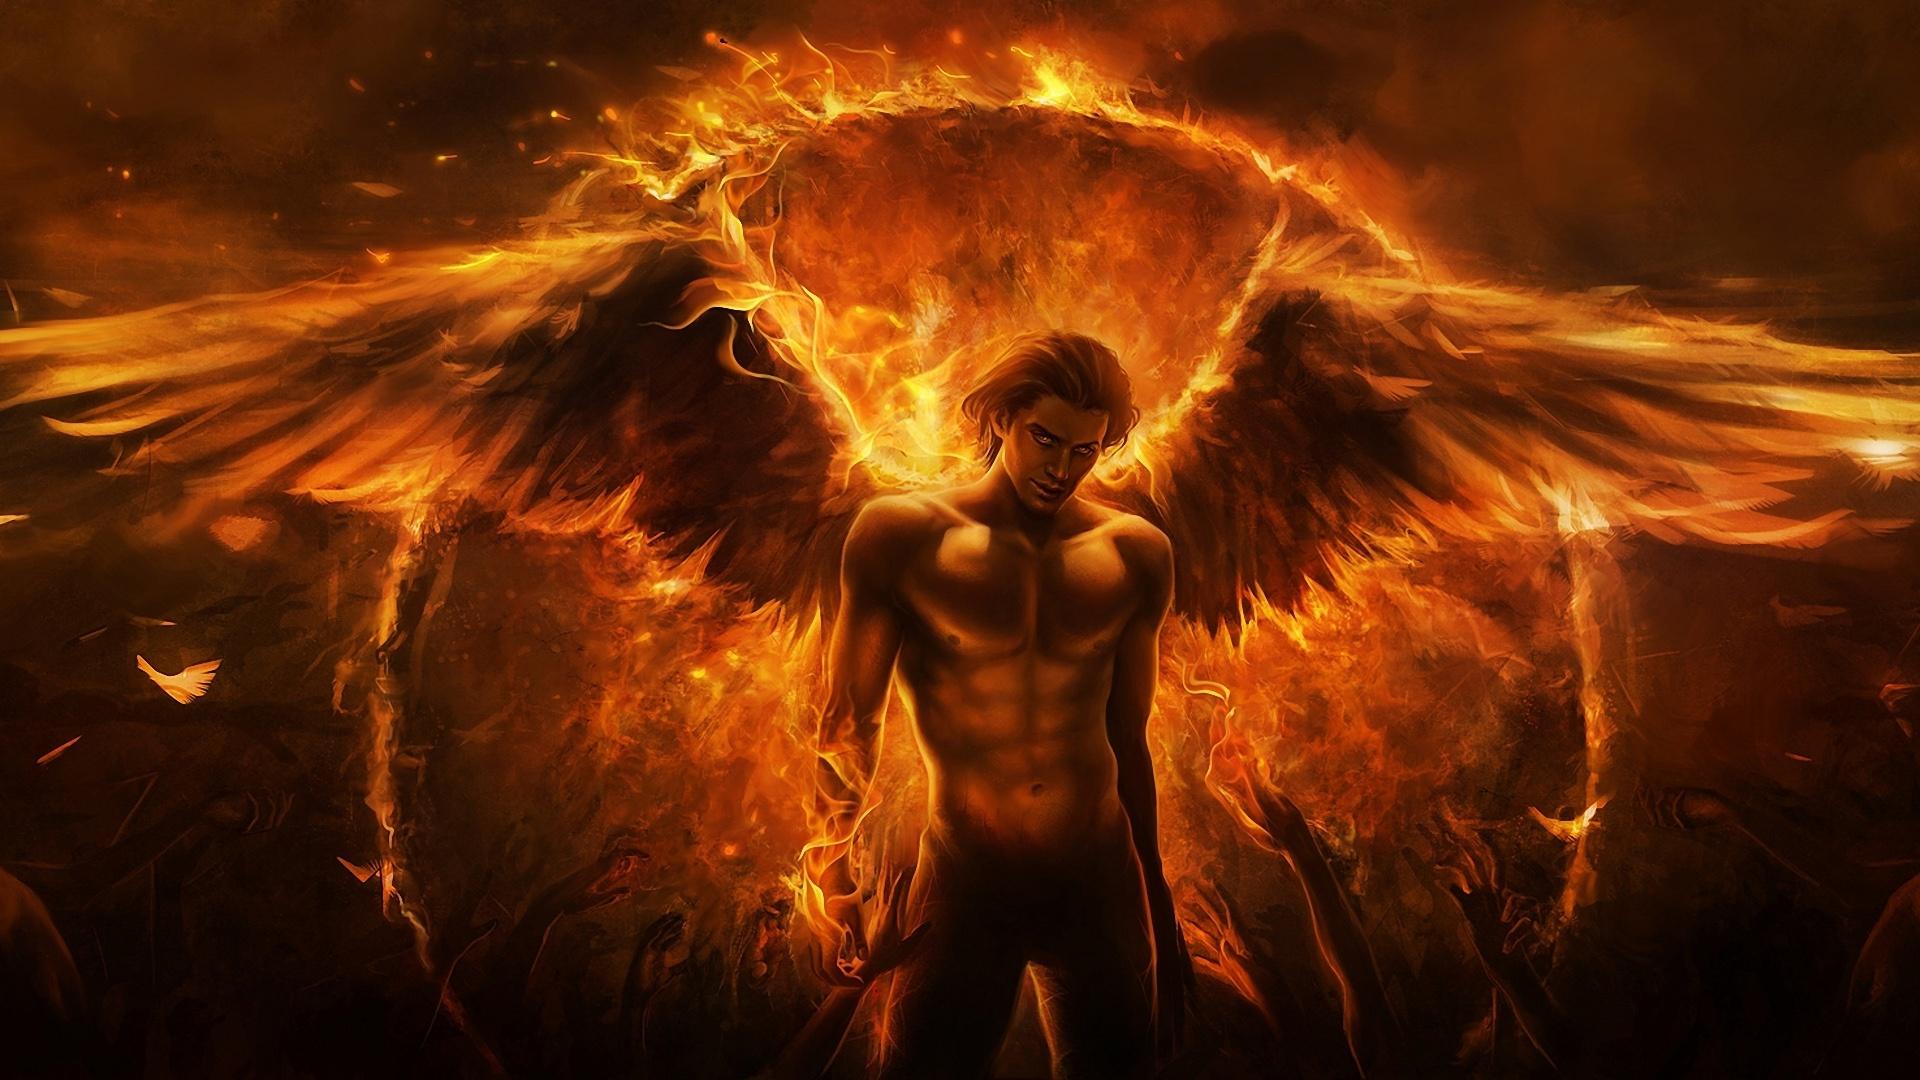 Wallpaper Black Magic Flame Angel 1920x1080 Full HD Picture Image